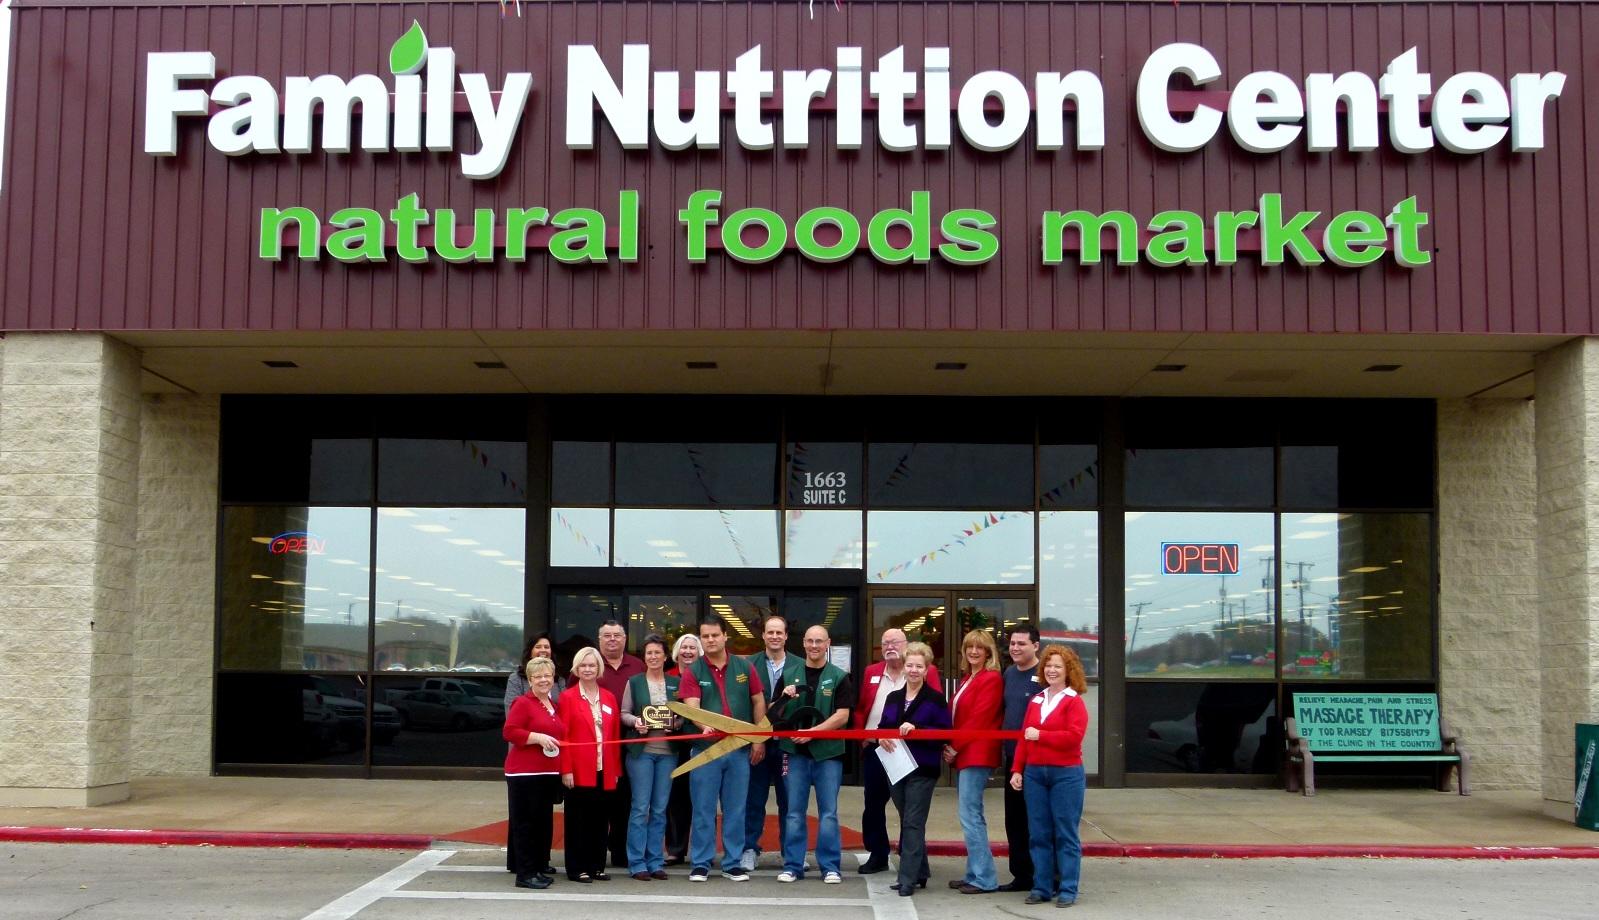 Family Nutrition Center (Cleburne)